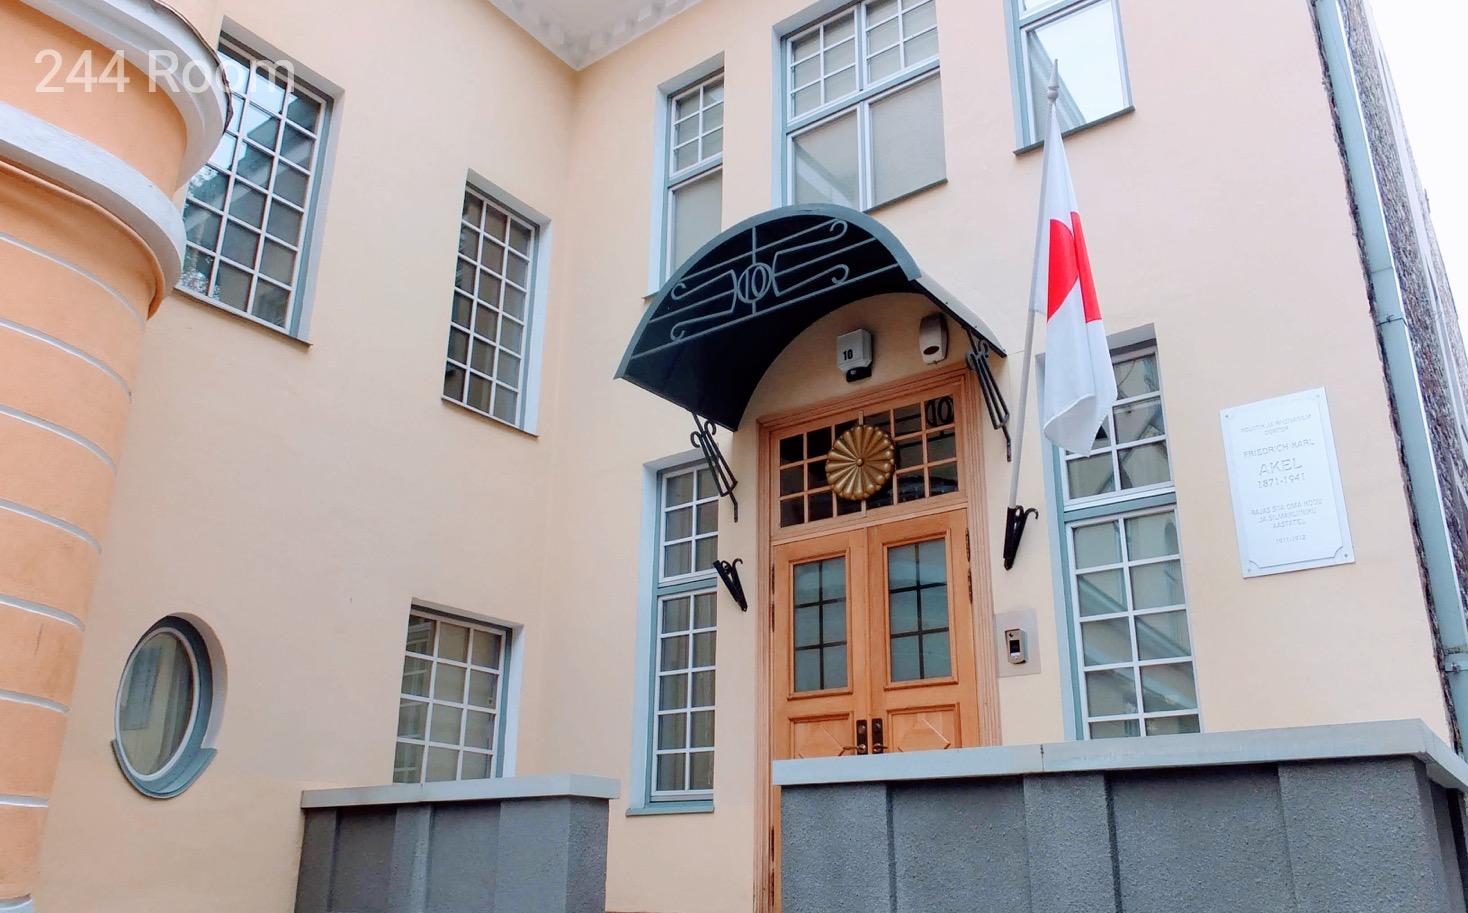 Tallinn-Japan sign3